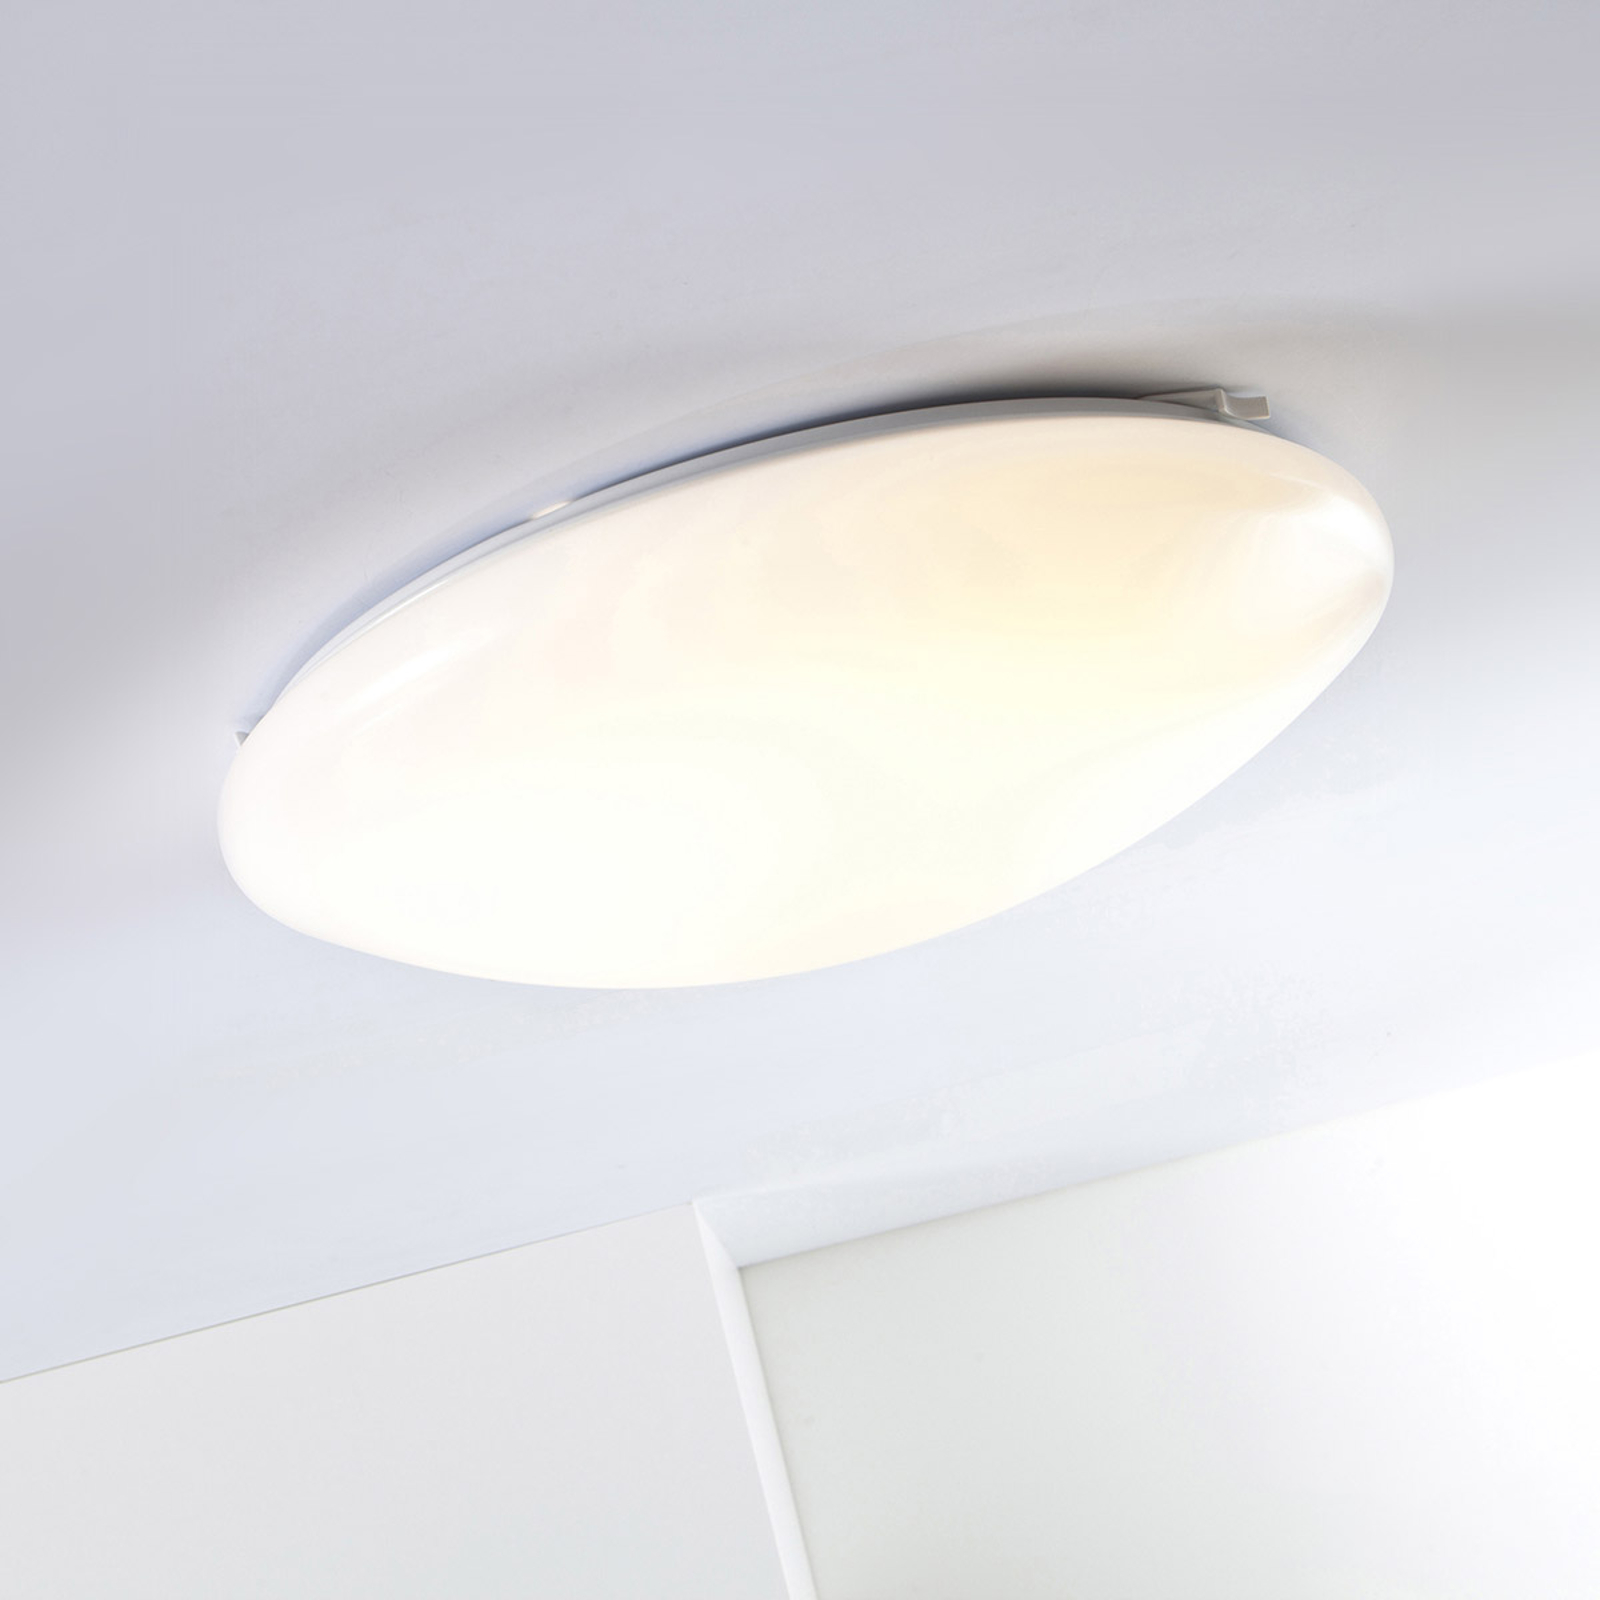 LED Basic rund taklampa från AEG, 14W